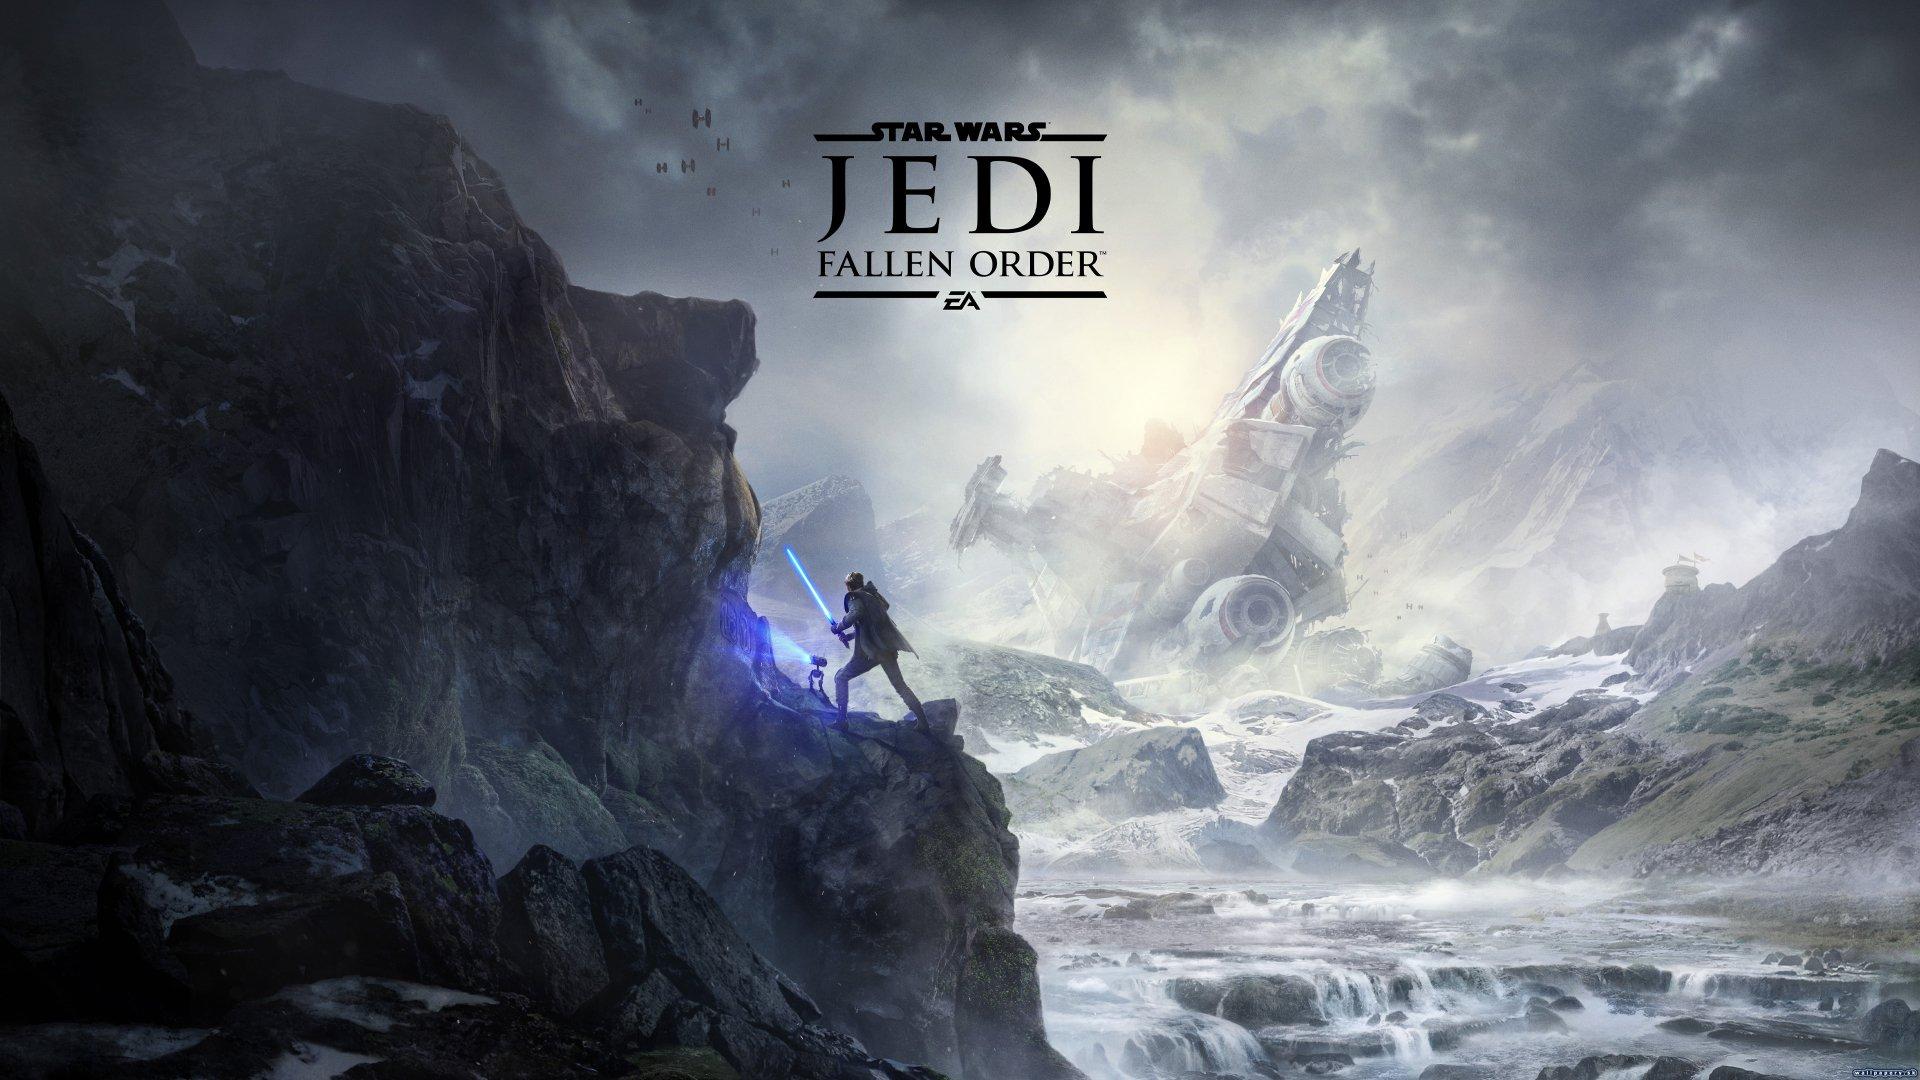 star wars jedi fallen order video game wallpaper 68897